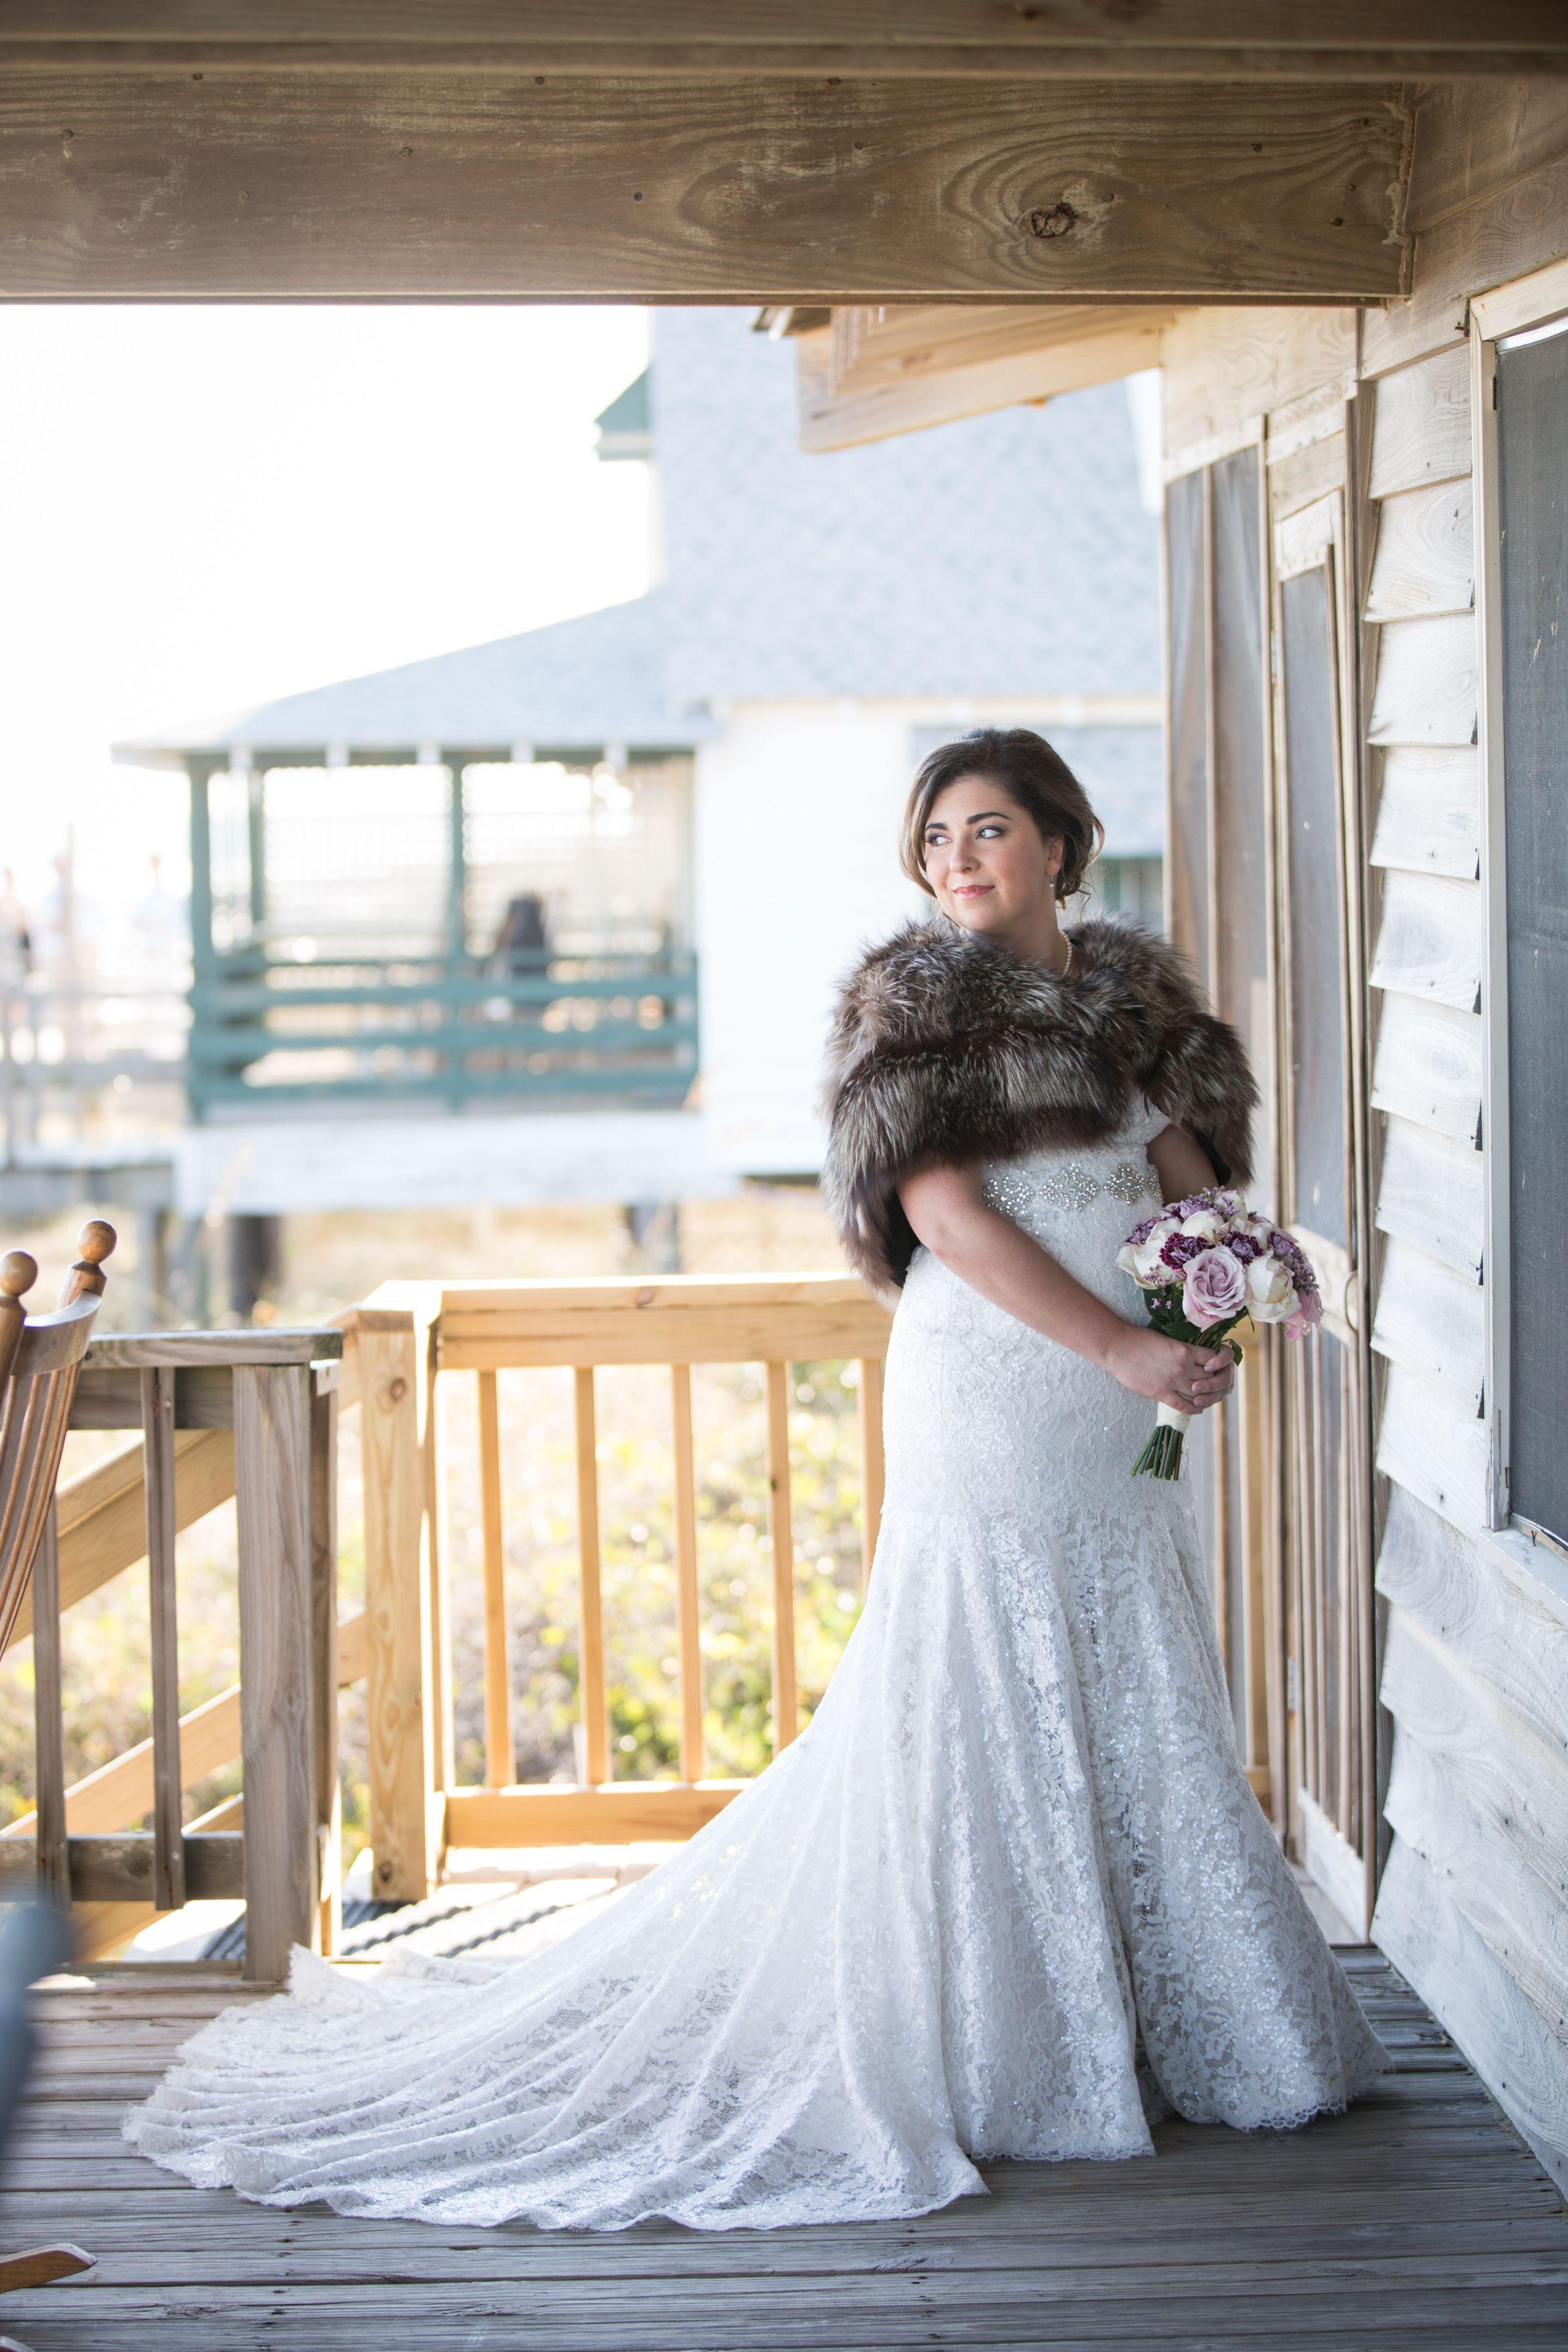 Fur wedding dress  VFRBrides Alexa and Ehrich Clark had a beautiful outdoor wedding in